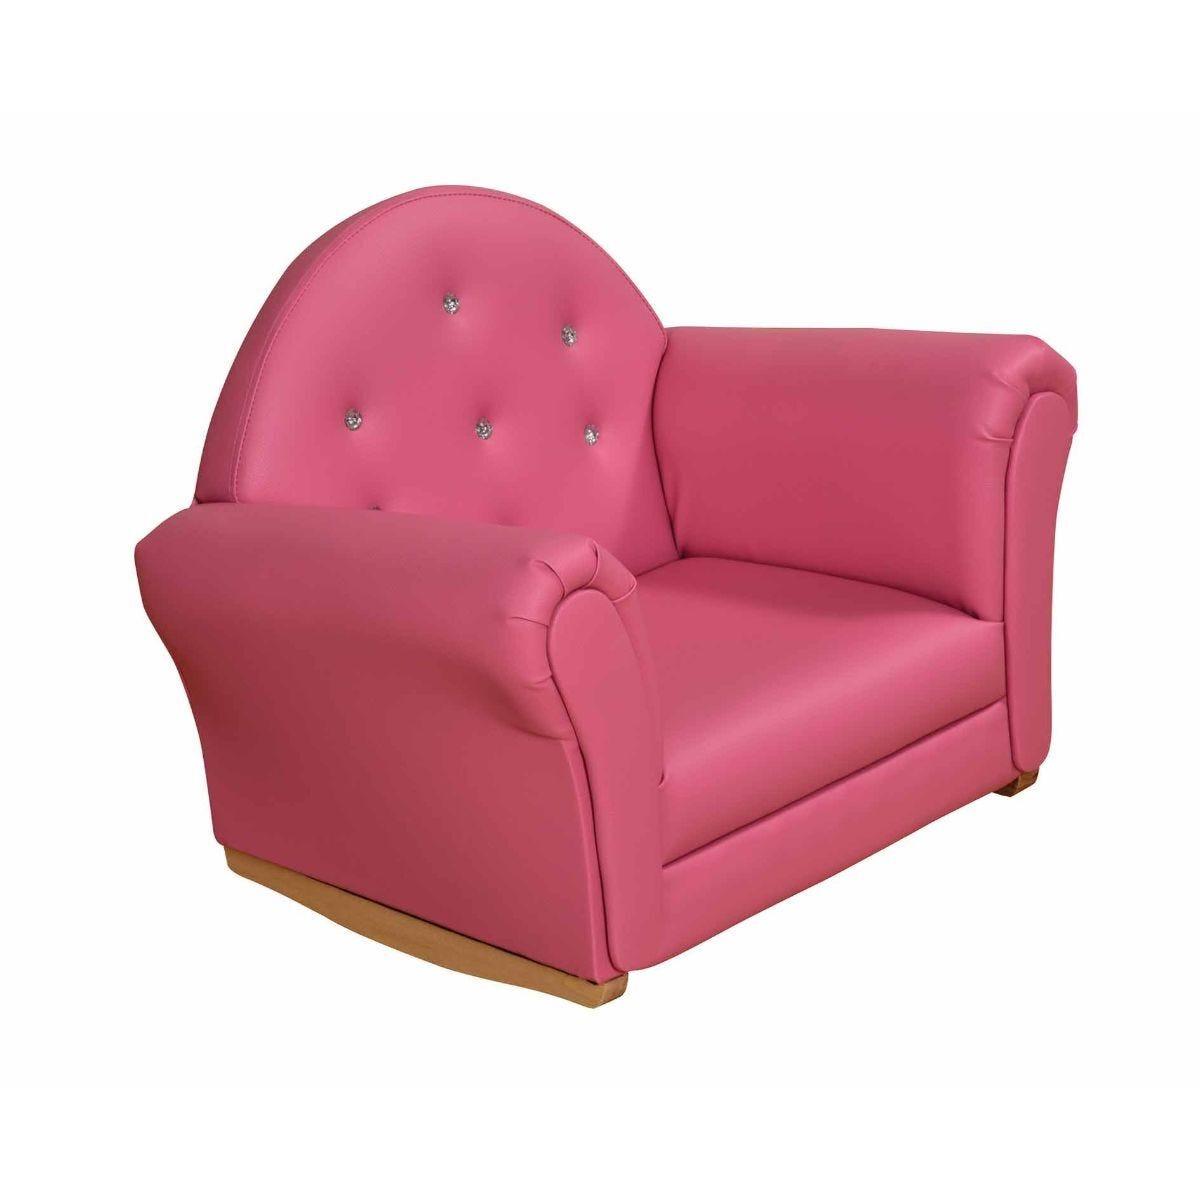 Childrens Pink Crystal Rocking Sofa Armchair